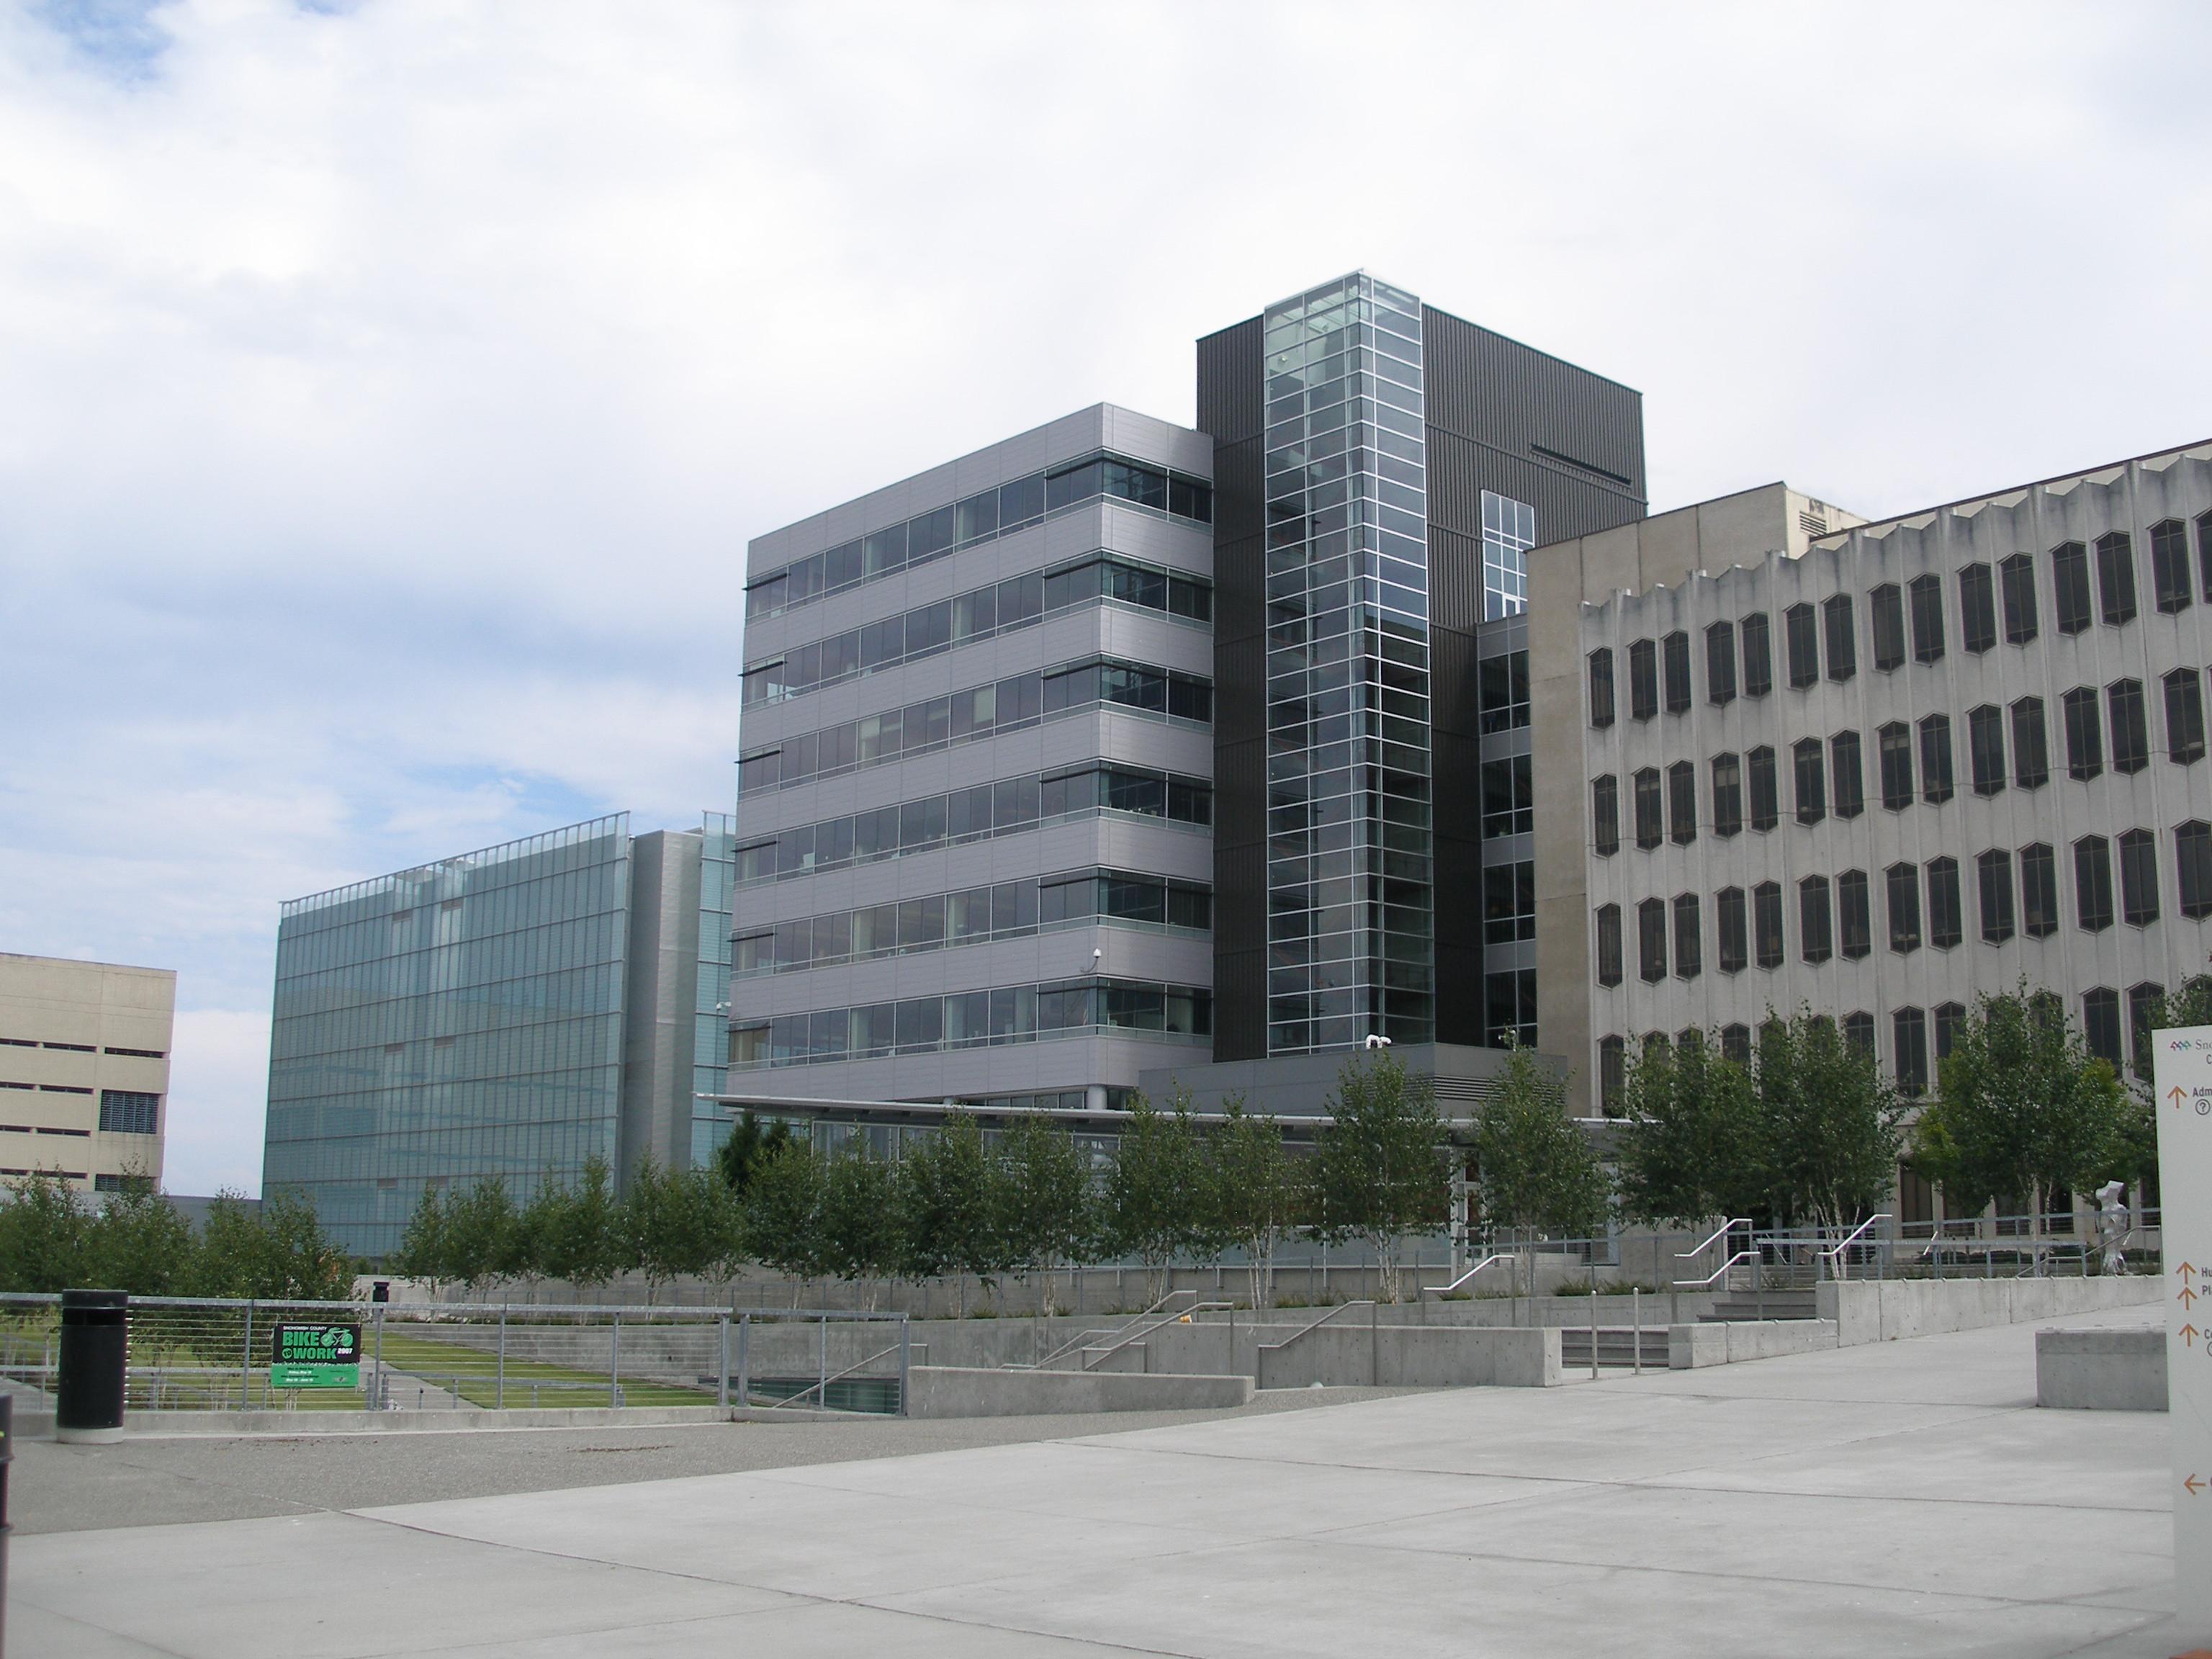 Snohomish County, Washington - Wikipedia